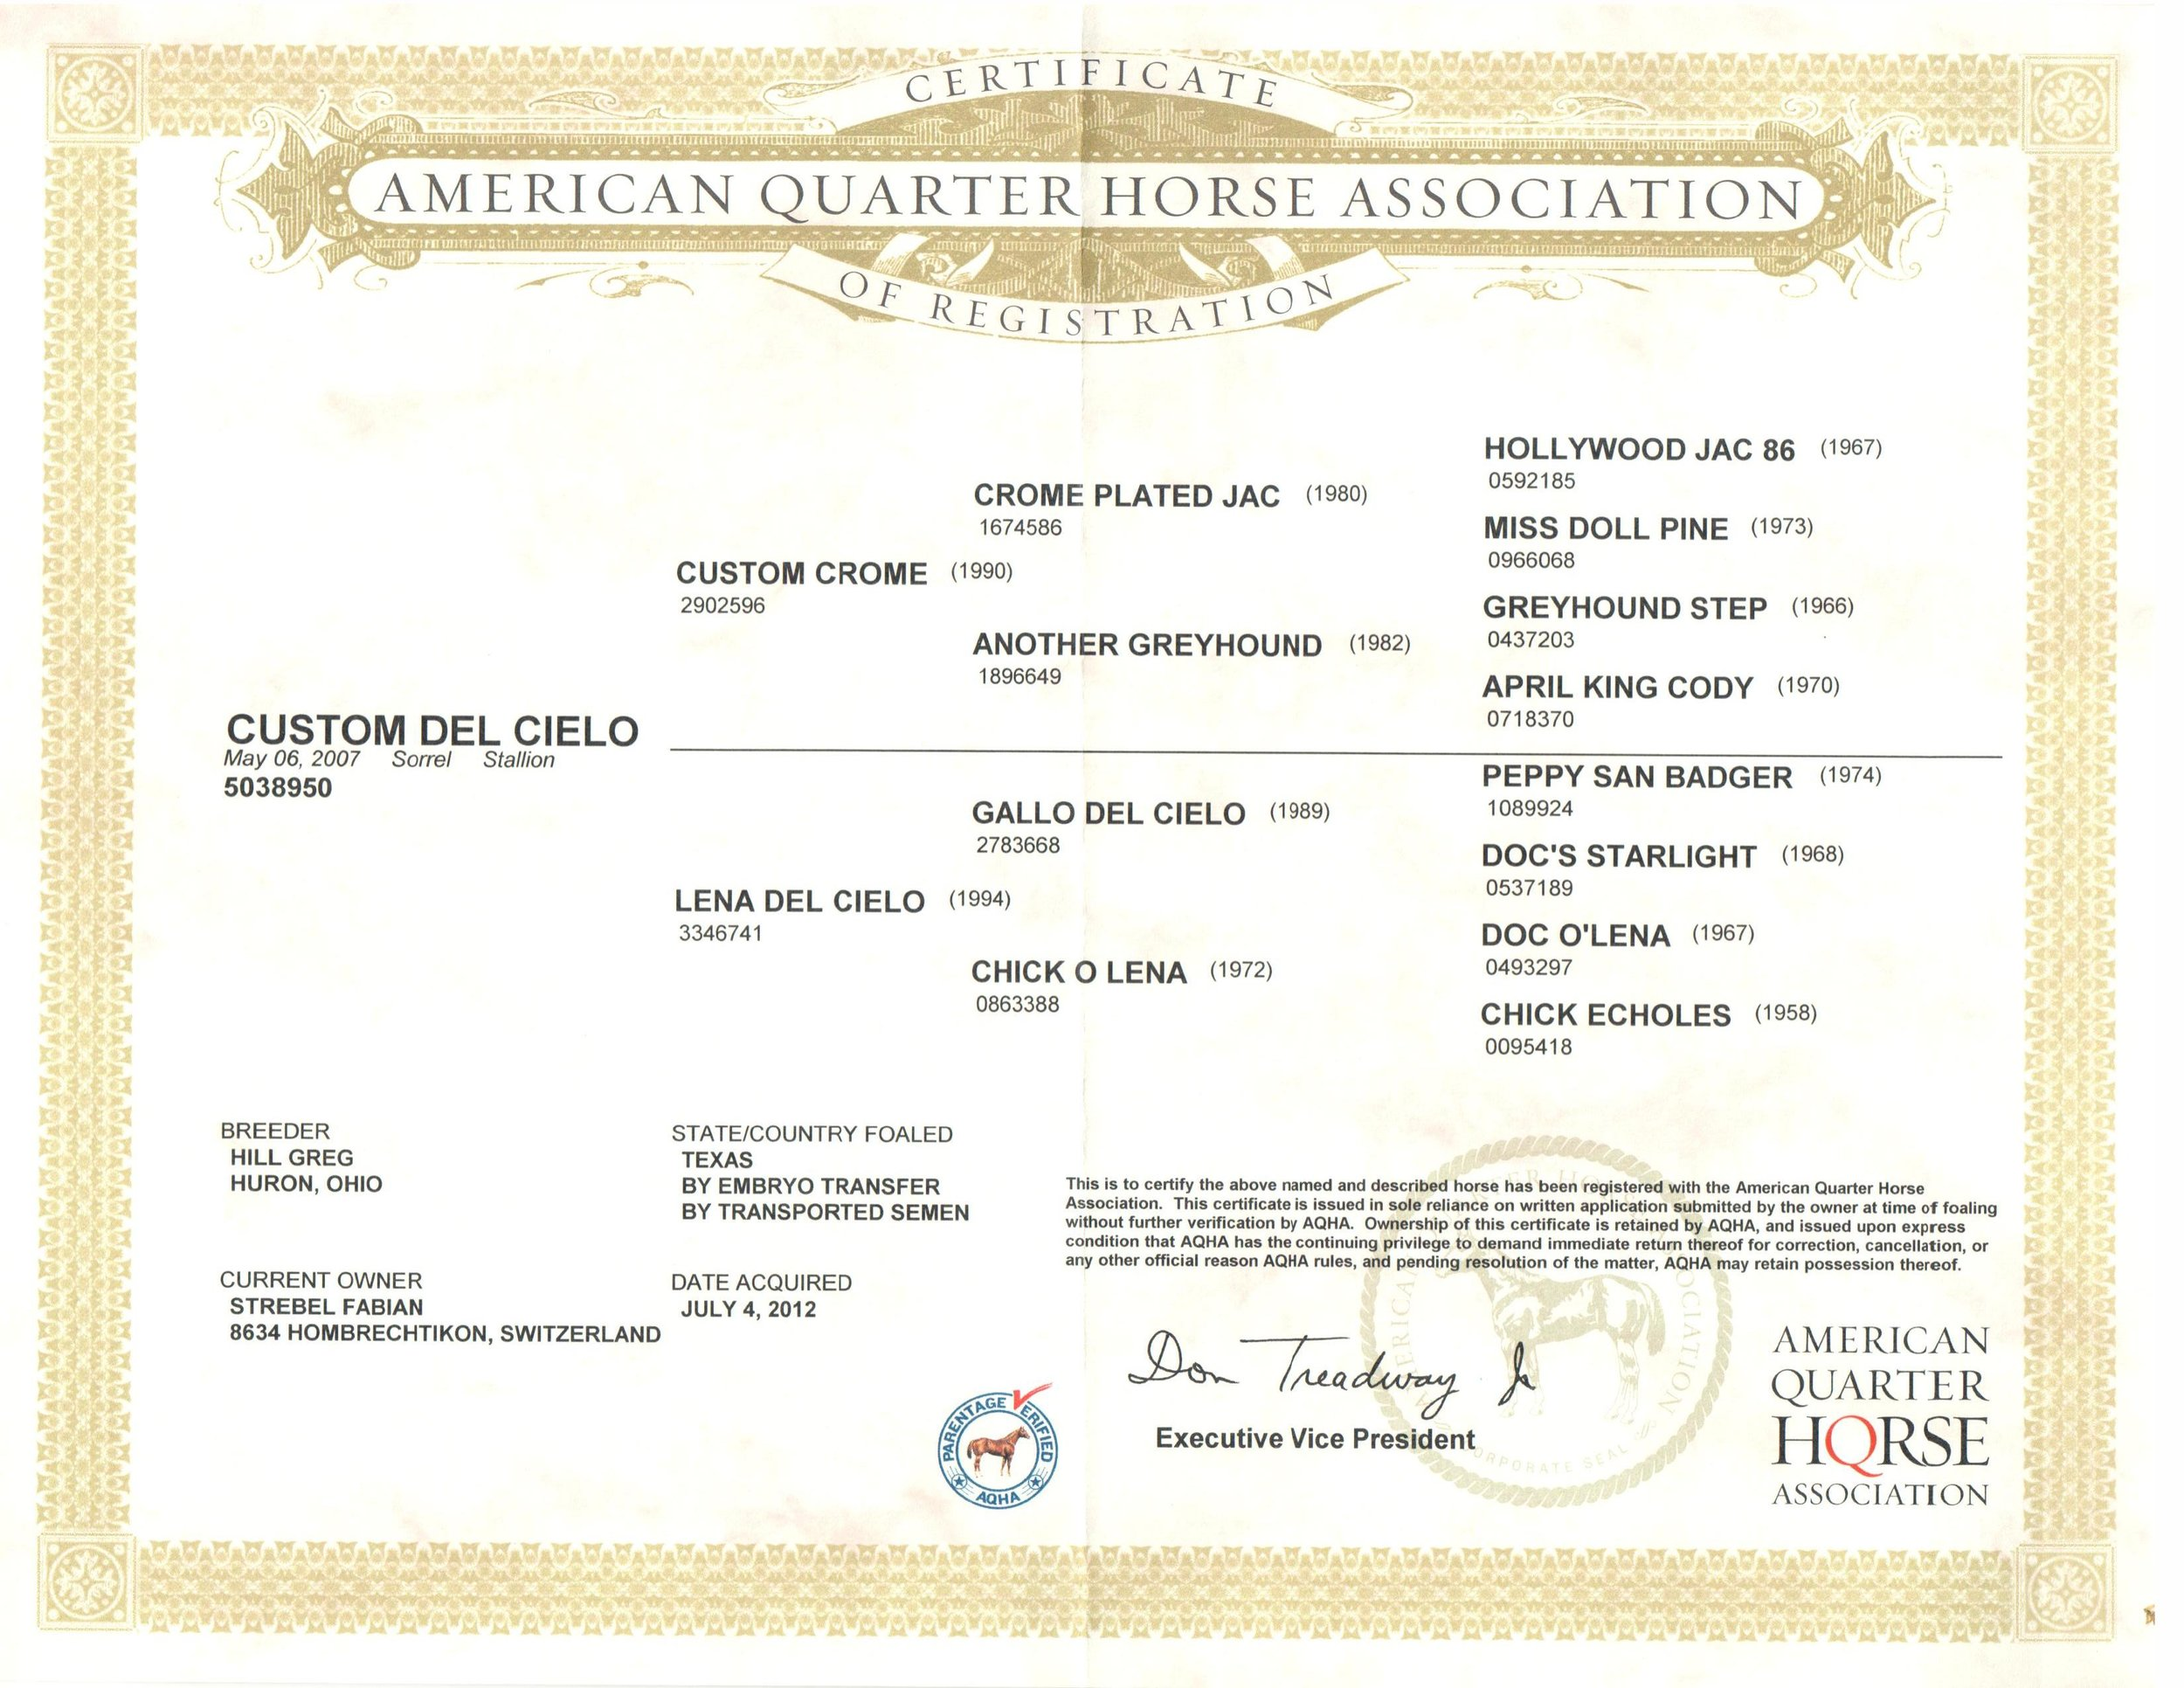 AQHA_Certificate.jpg